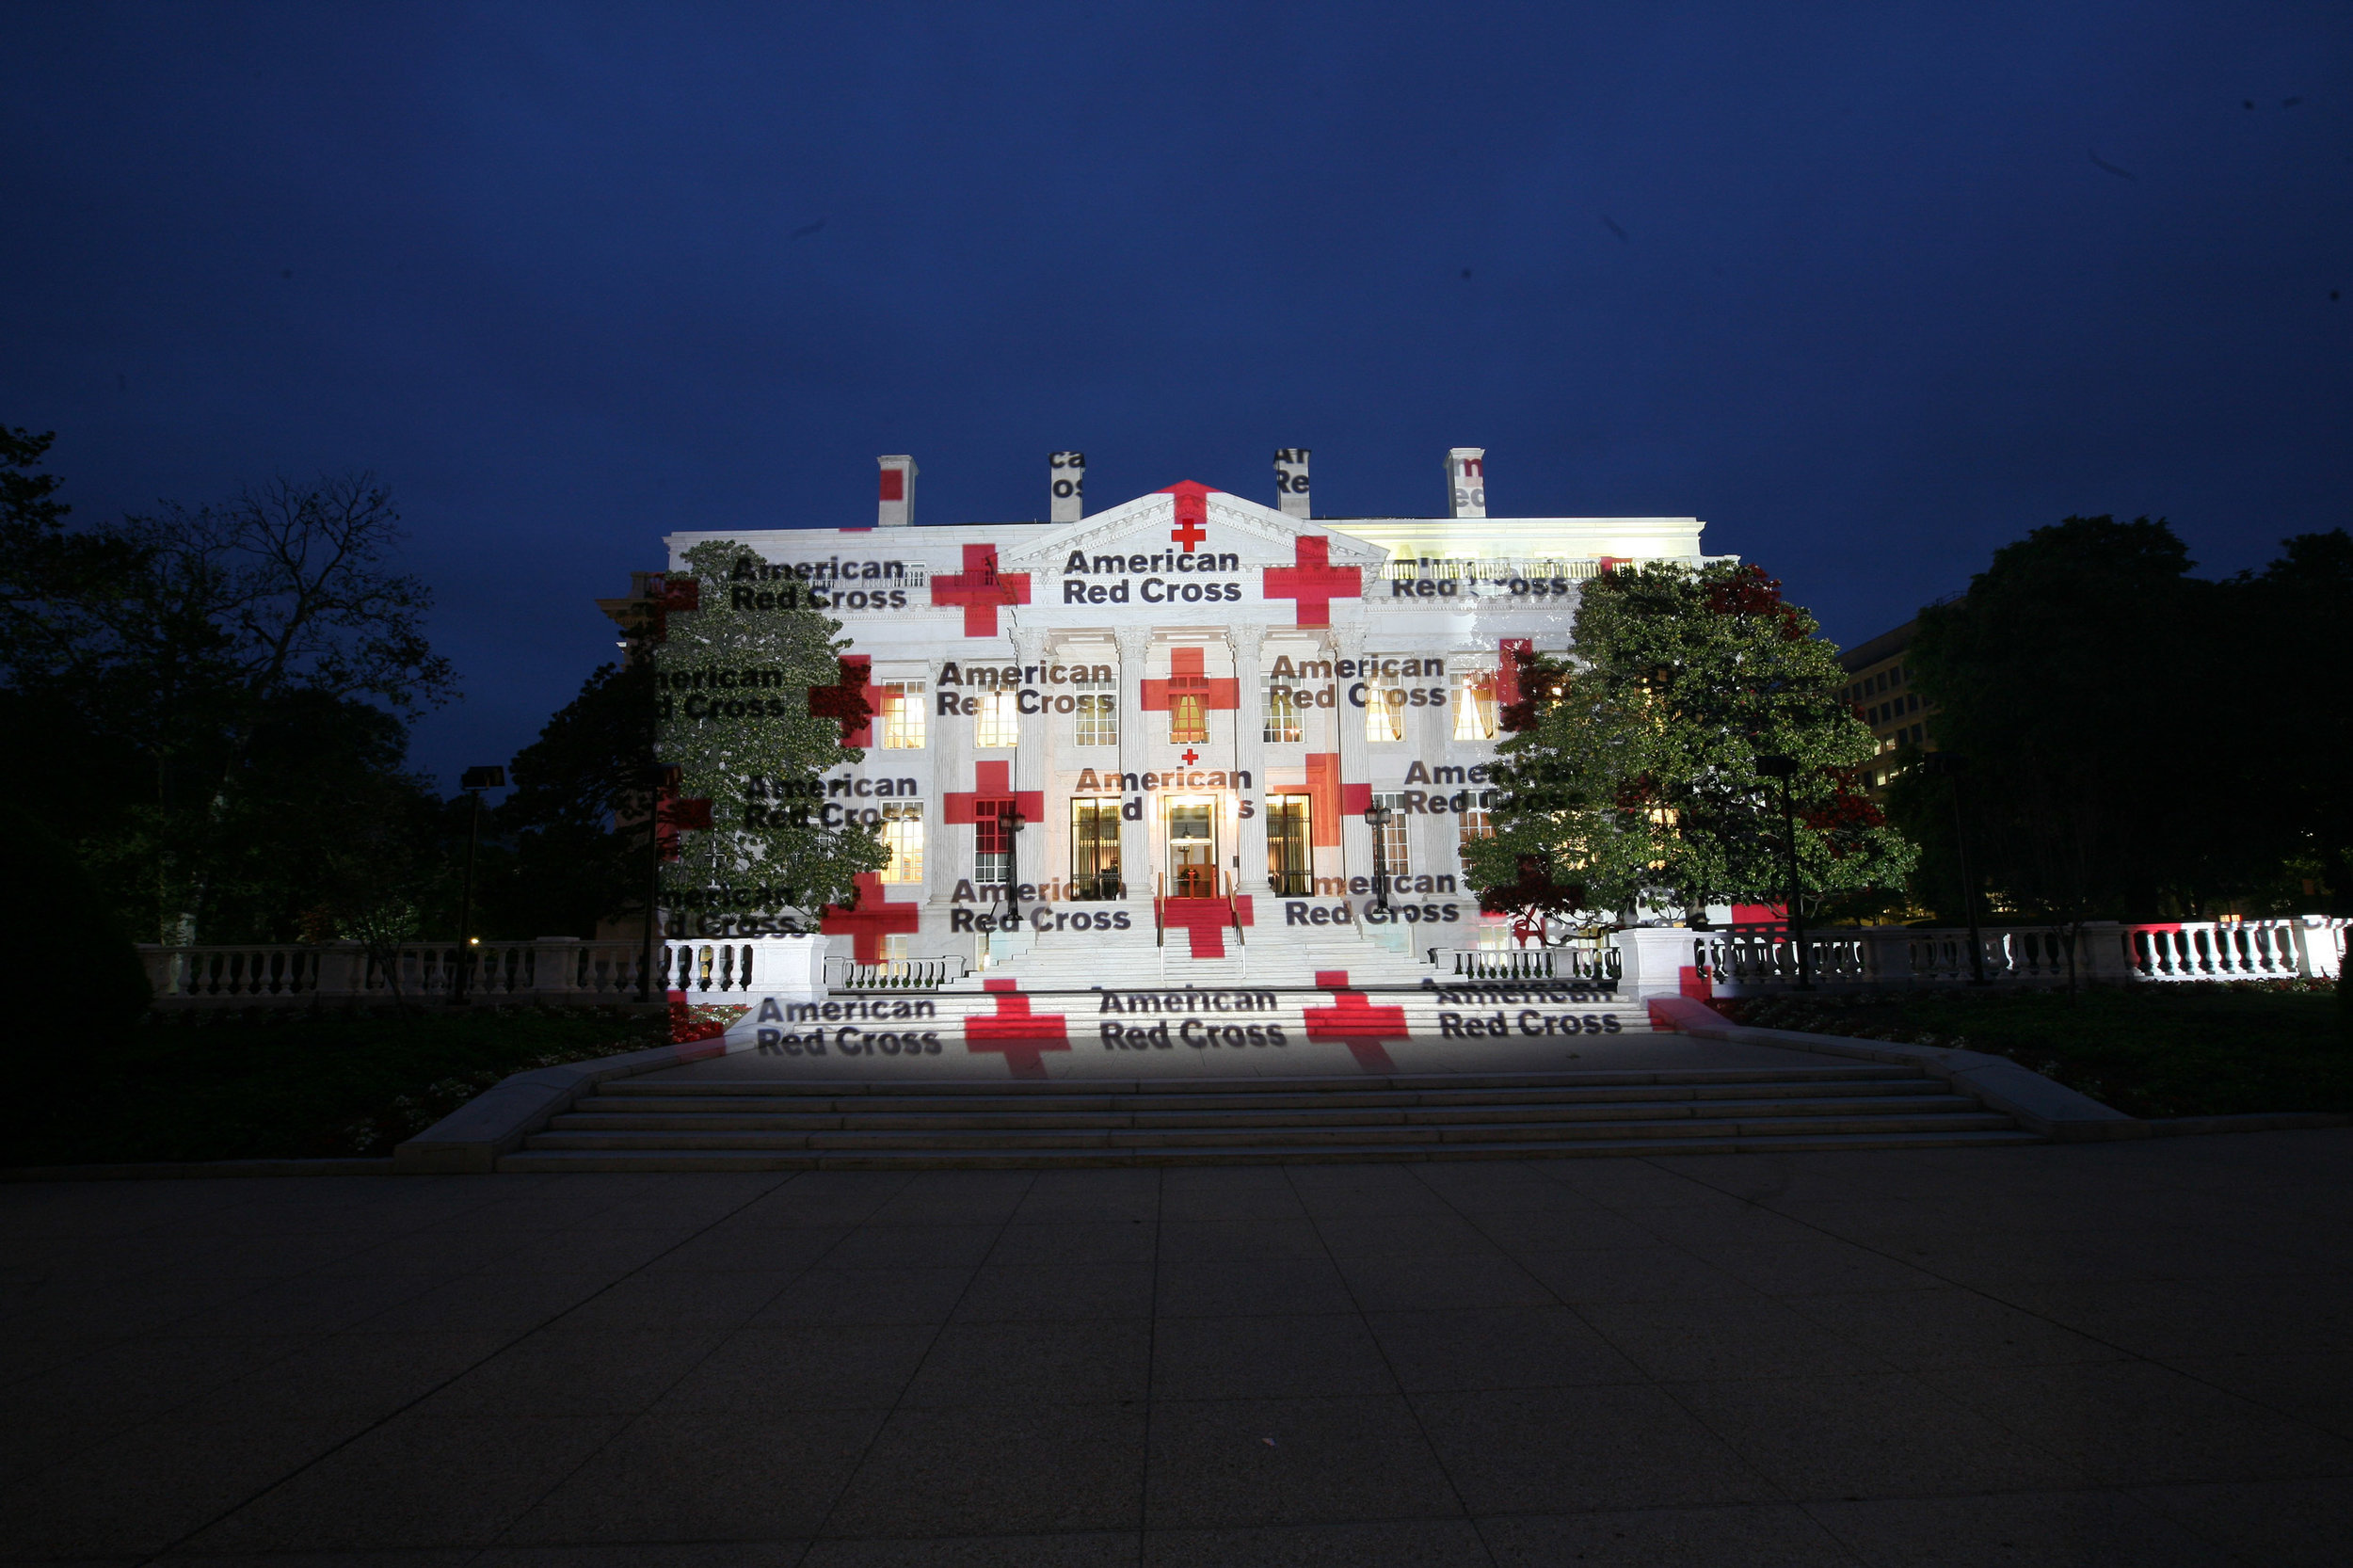 WASHINGTON HQ OF RED CROSS AMERICA